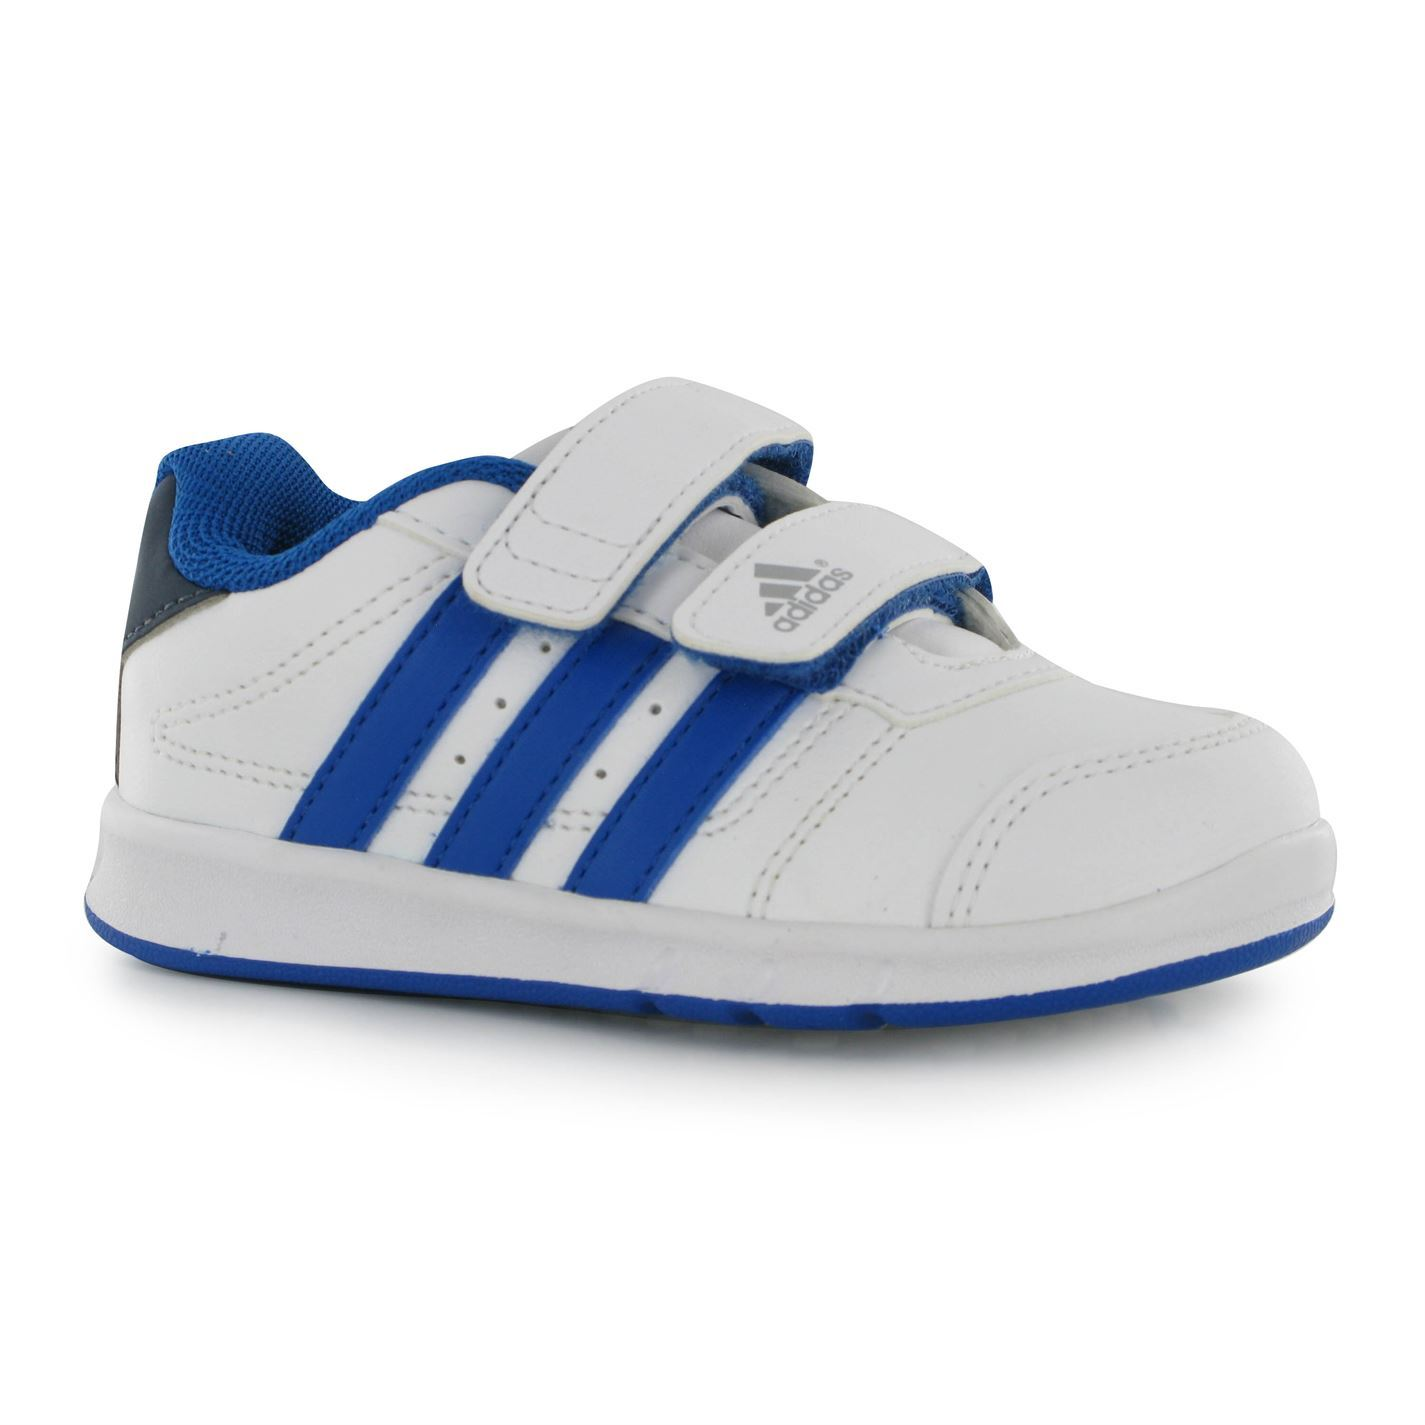 adidas kids trainers